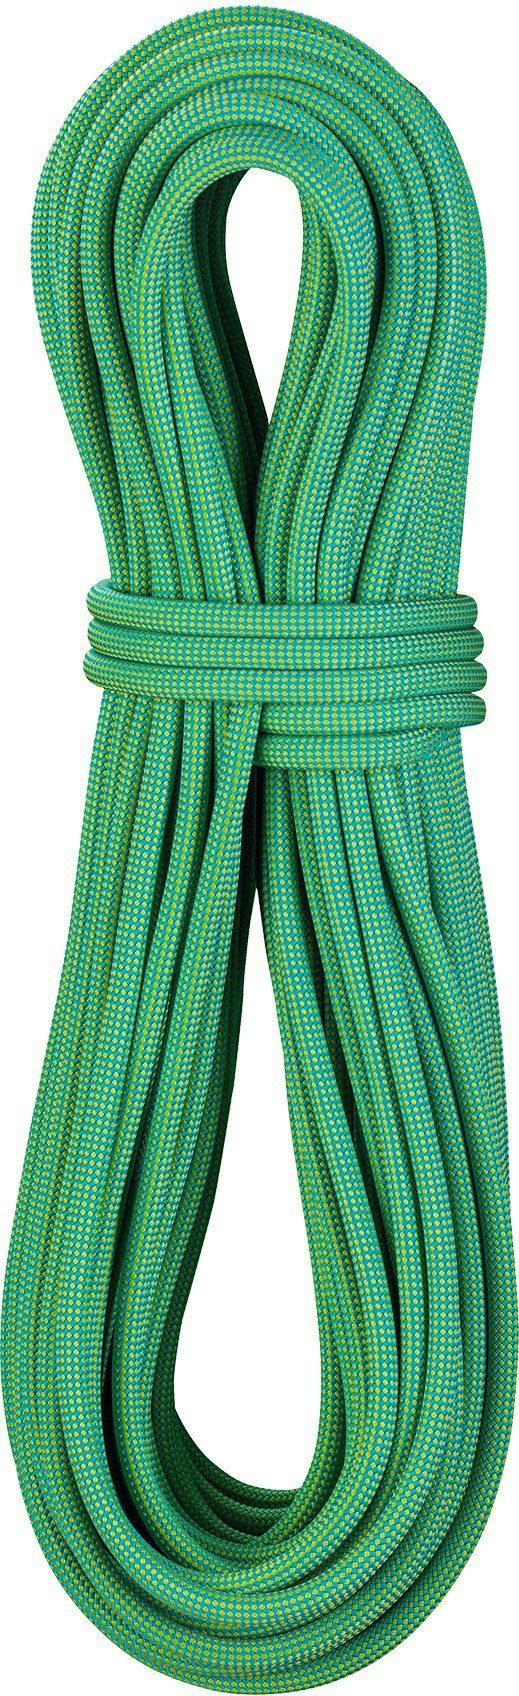 Edelrid Kletterseil »Eagle Lite Pro Dry Rope 9,5mm 50m«